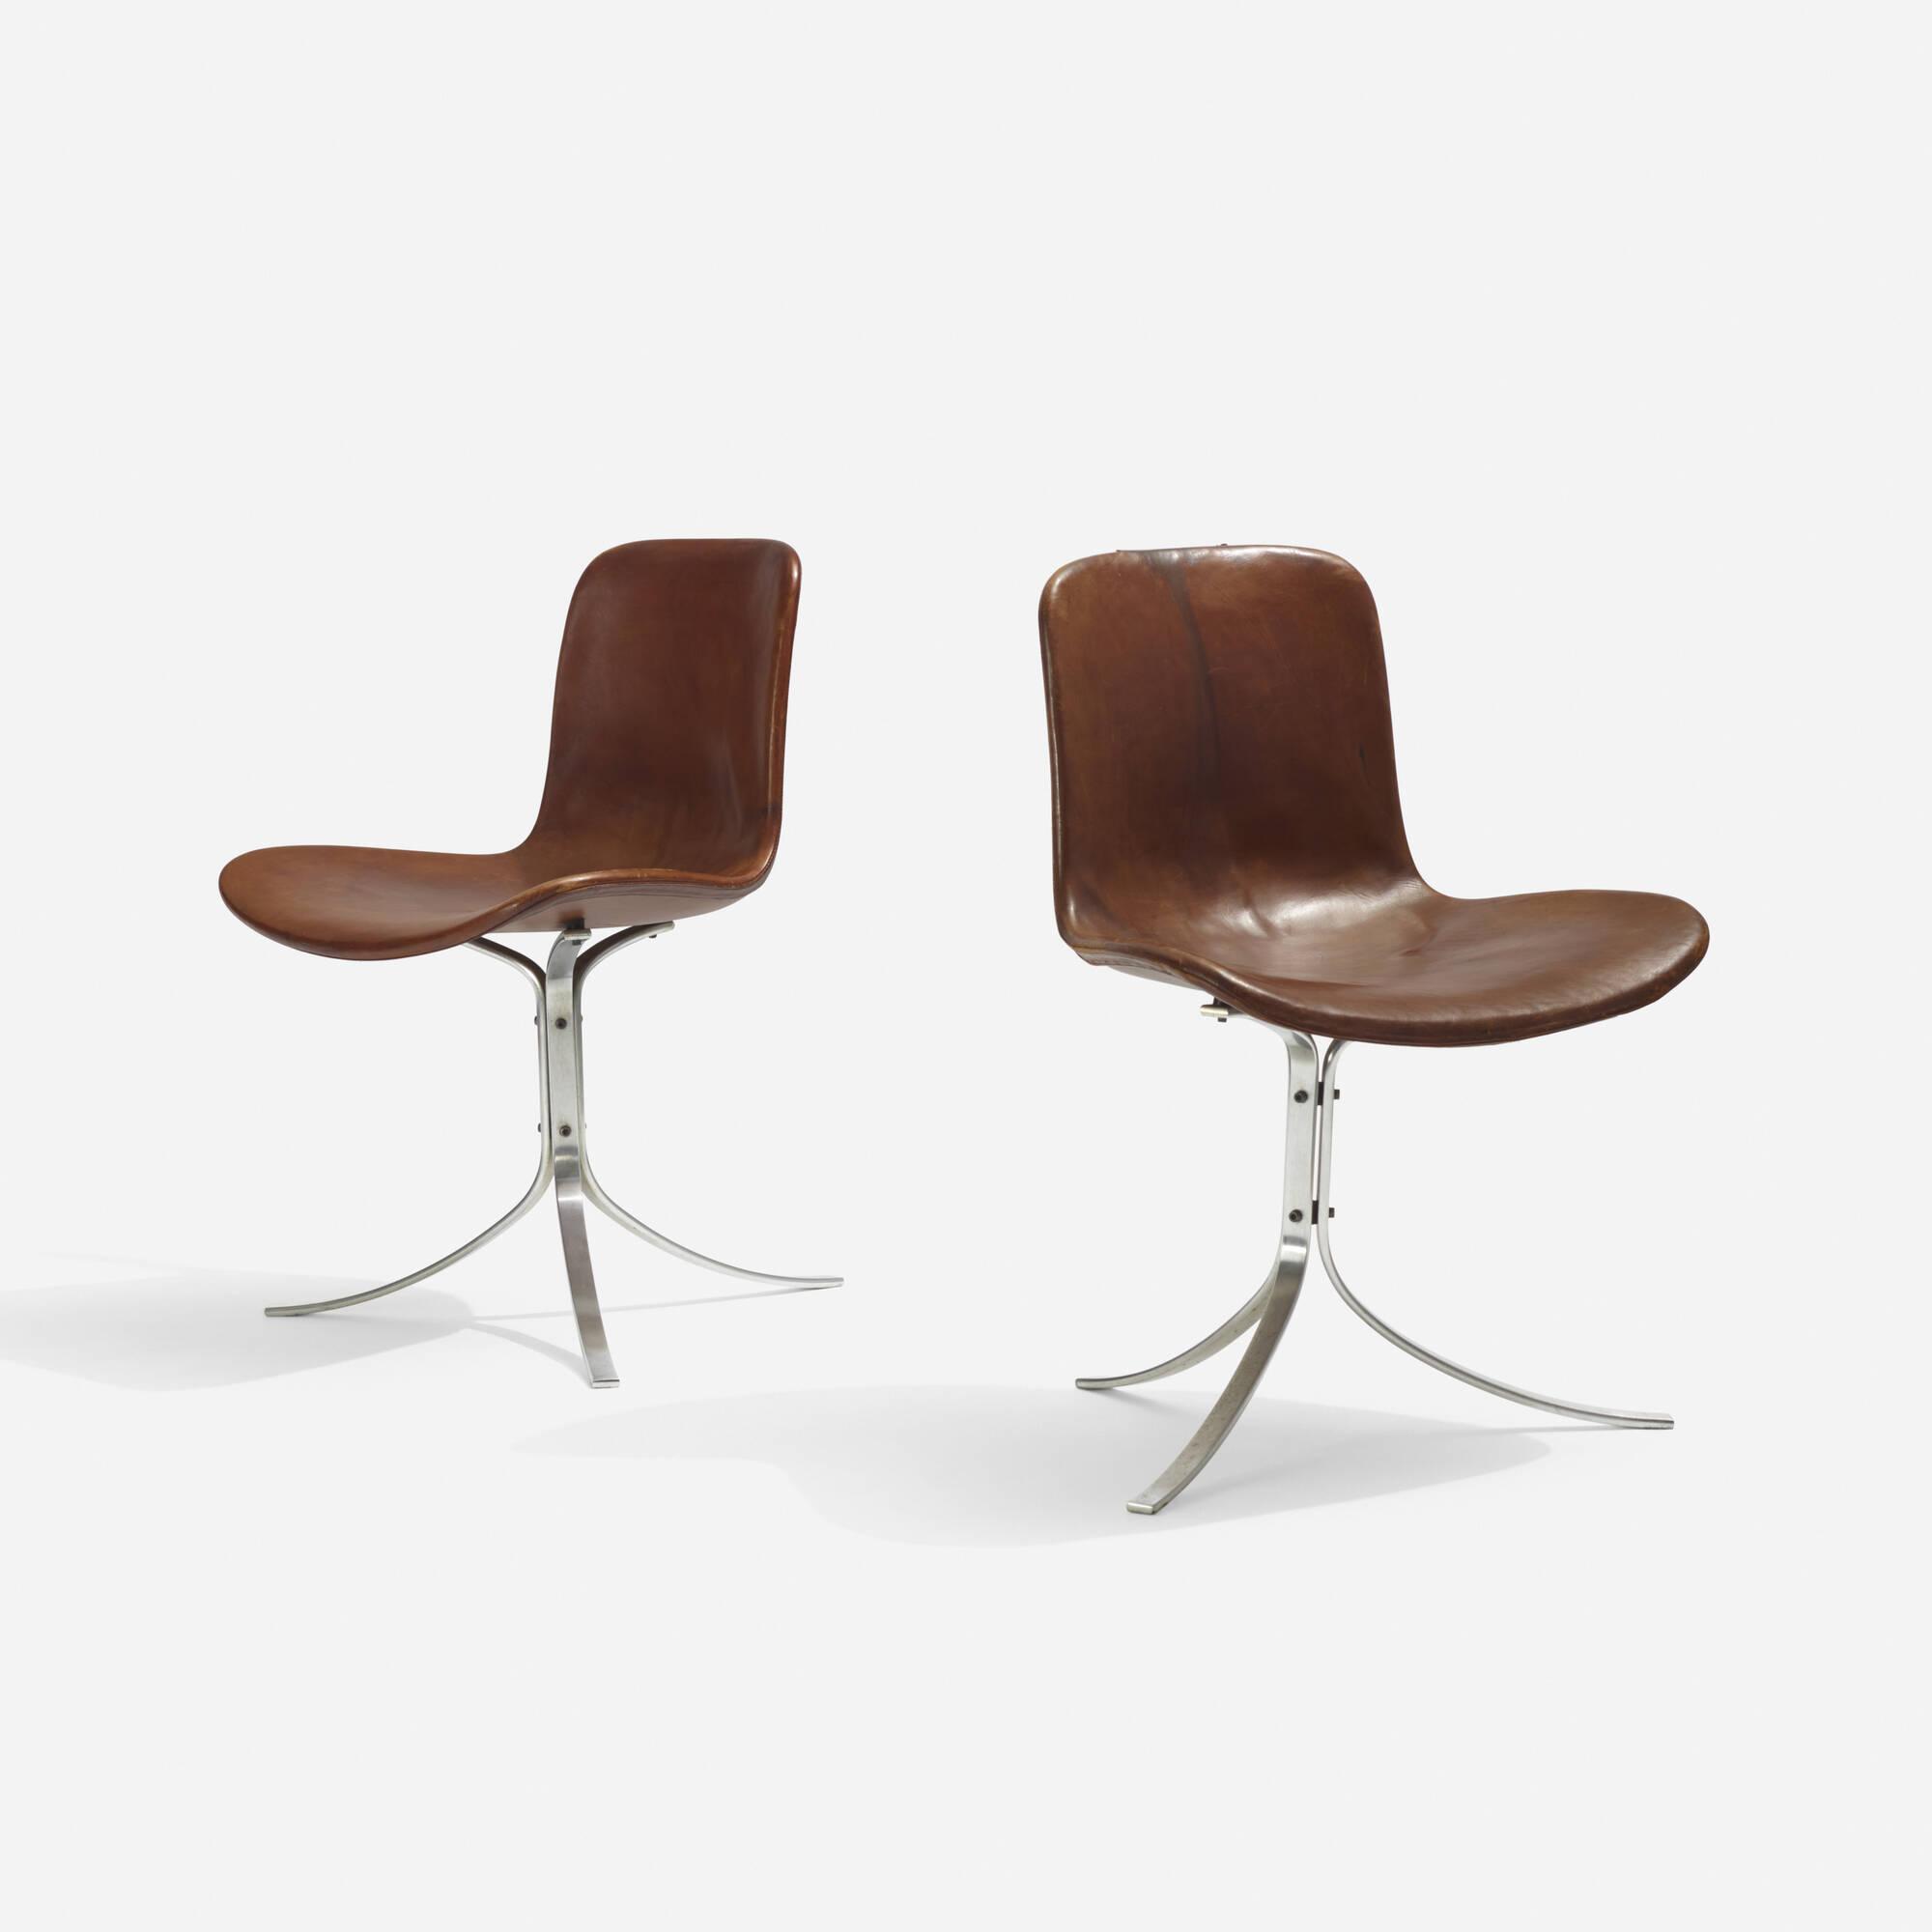 137: Poul Kjaerholm / PK 9 chairs, pair (1 of 3)